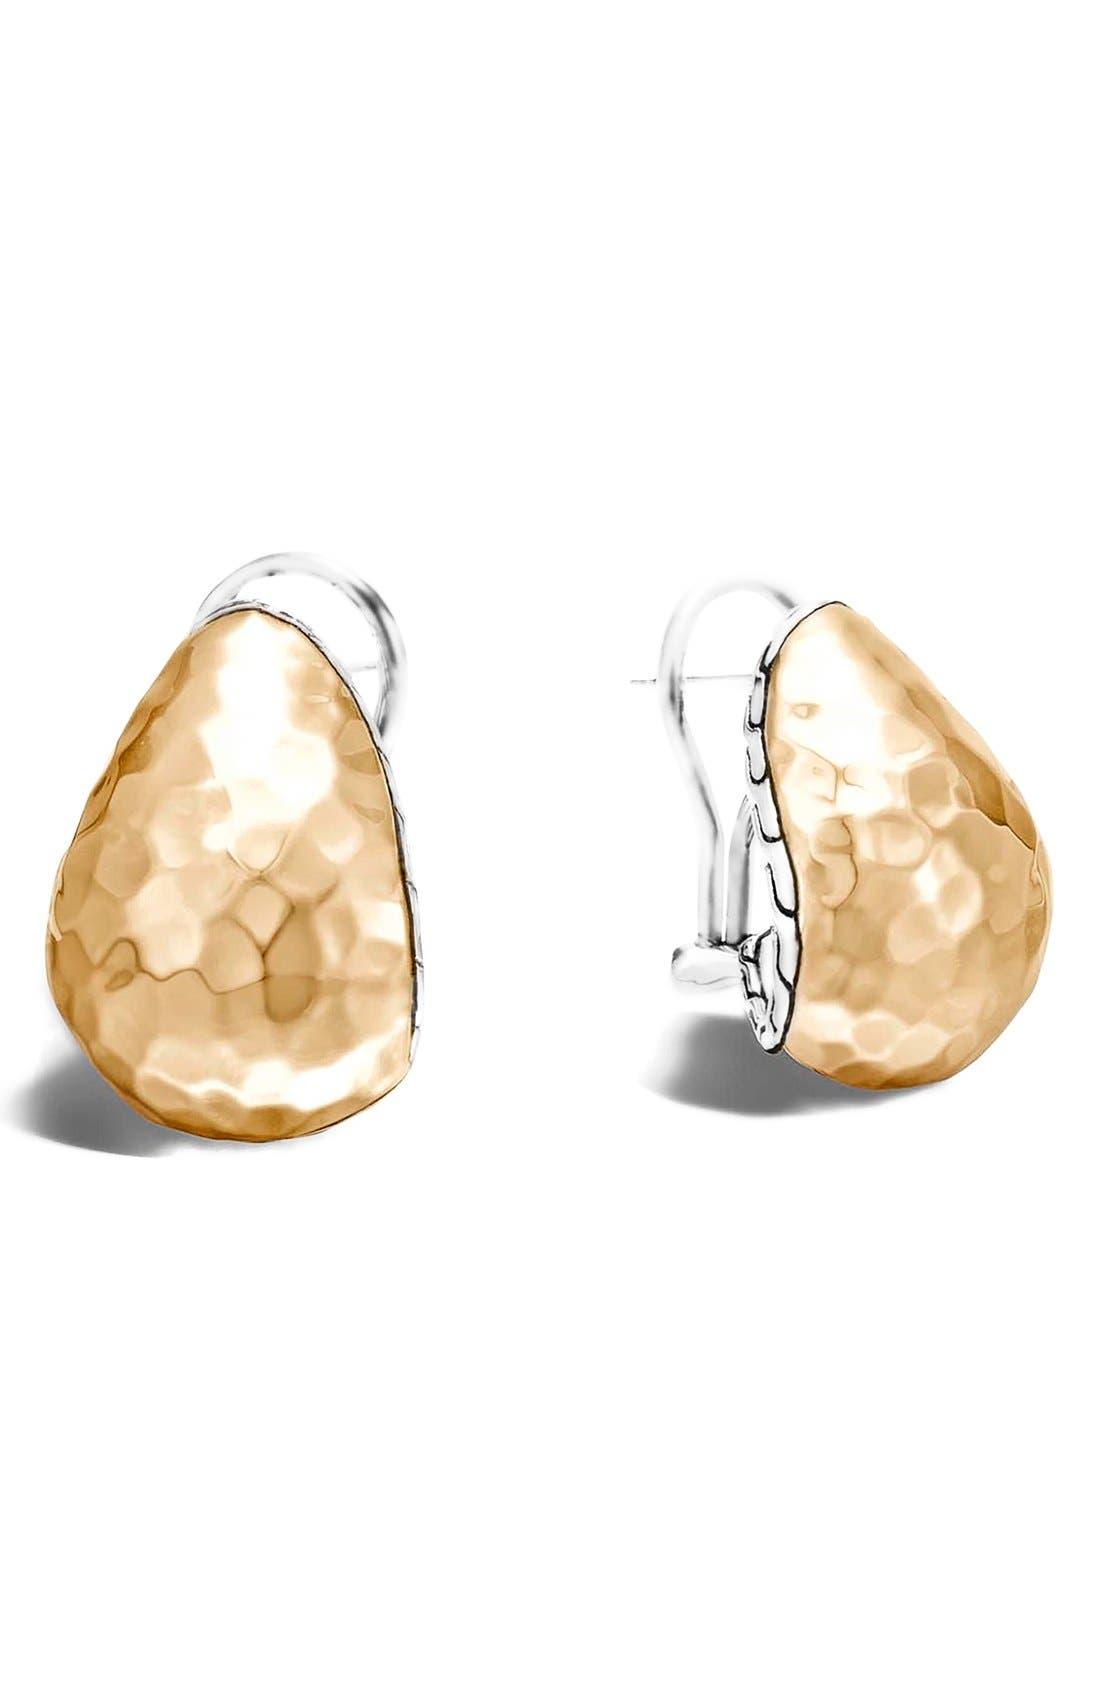 Main Image - John Hardy 'Classic Chain - Buddha Belly' Stud Earrings